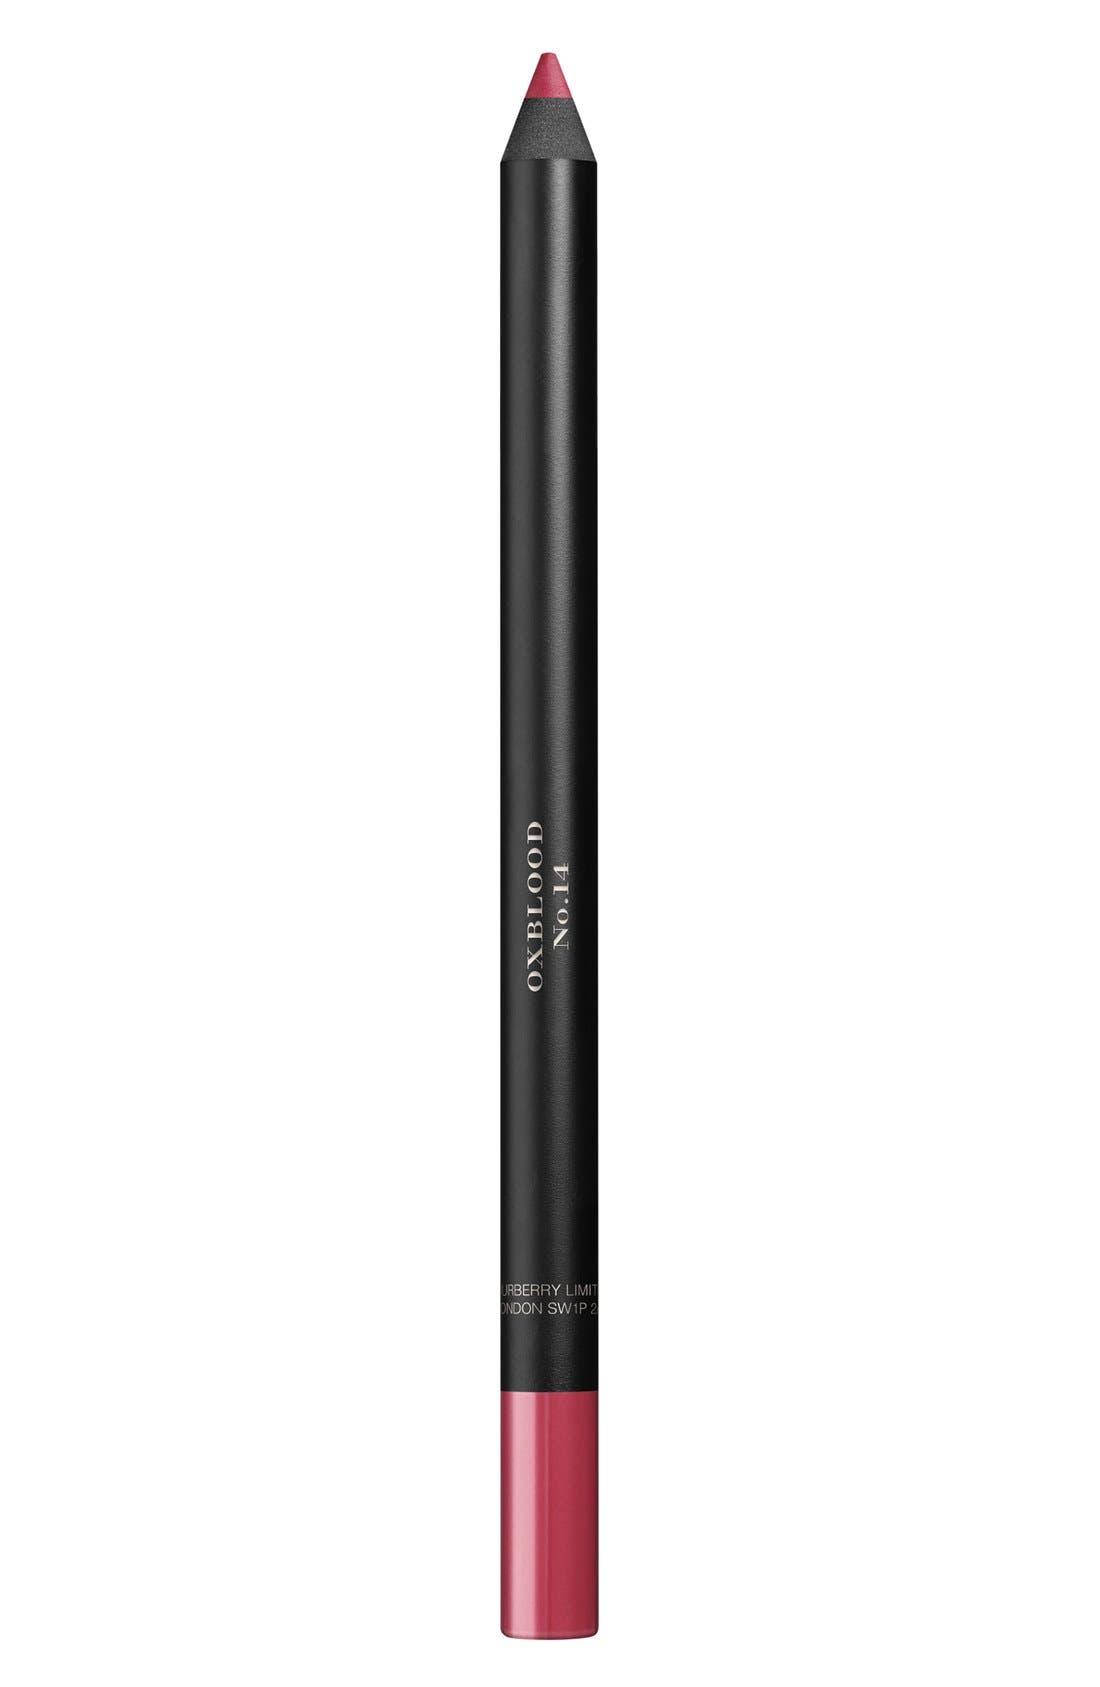 Burberry Beauty Lip Definer